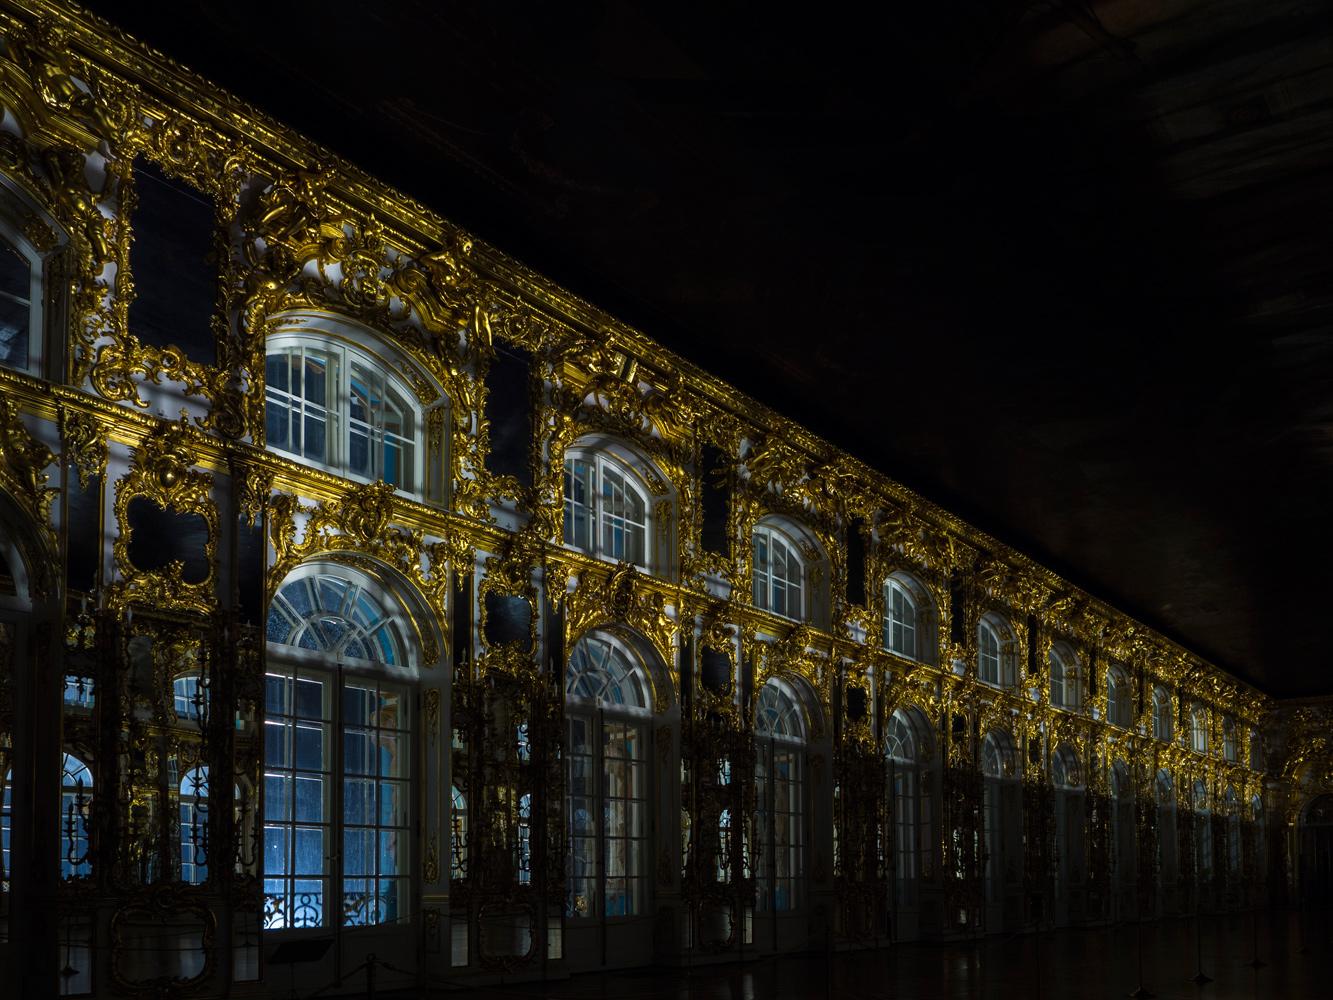 Екатерининский дворец москва фотосессия